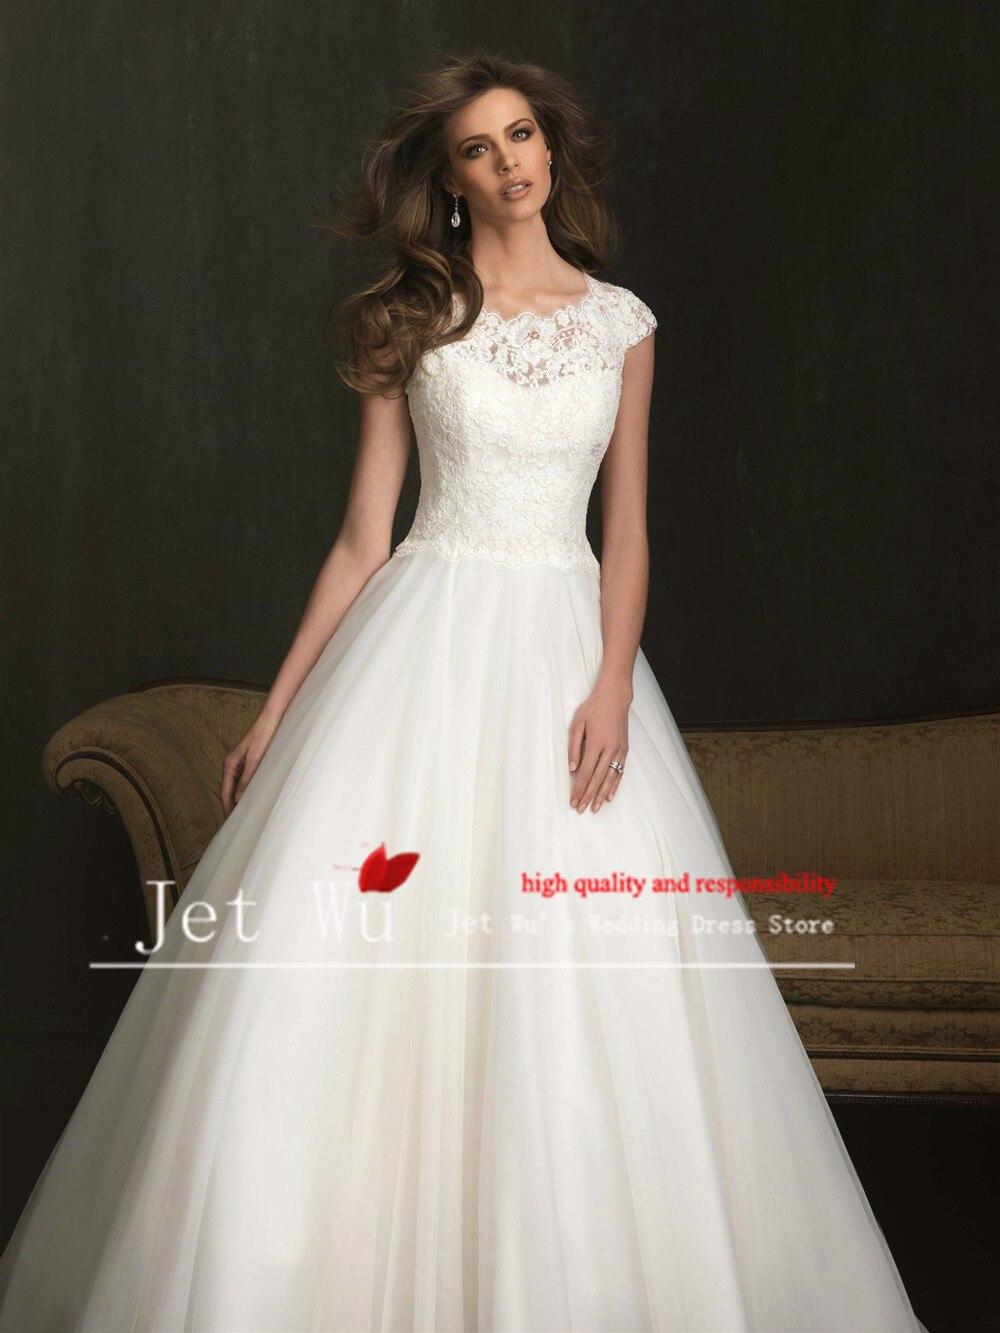 budget grecian wedding dress cowl neck wedding dress Picture